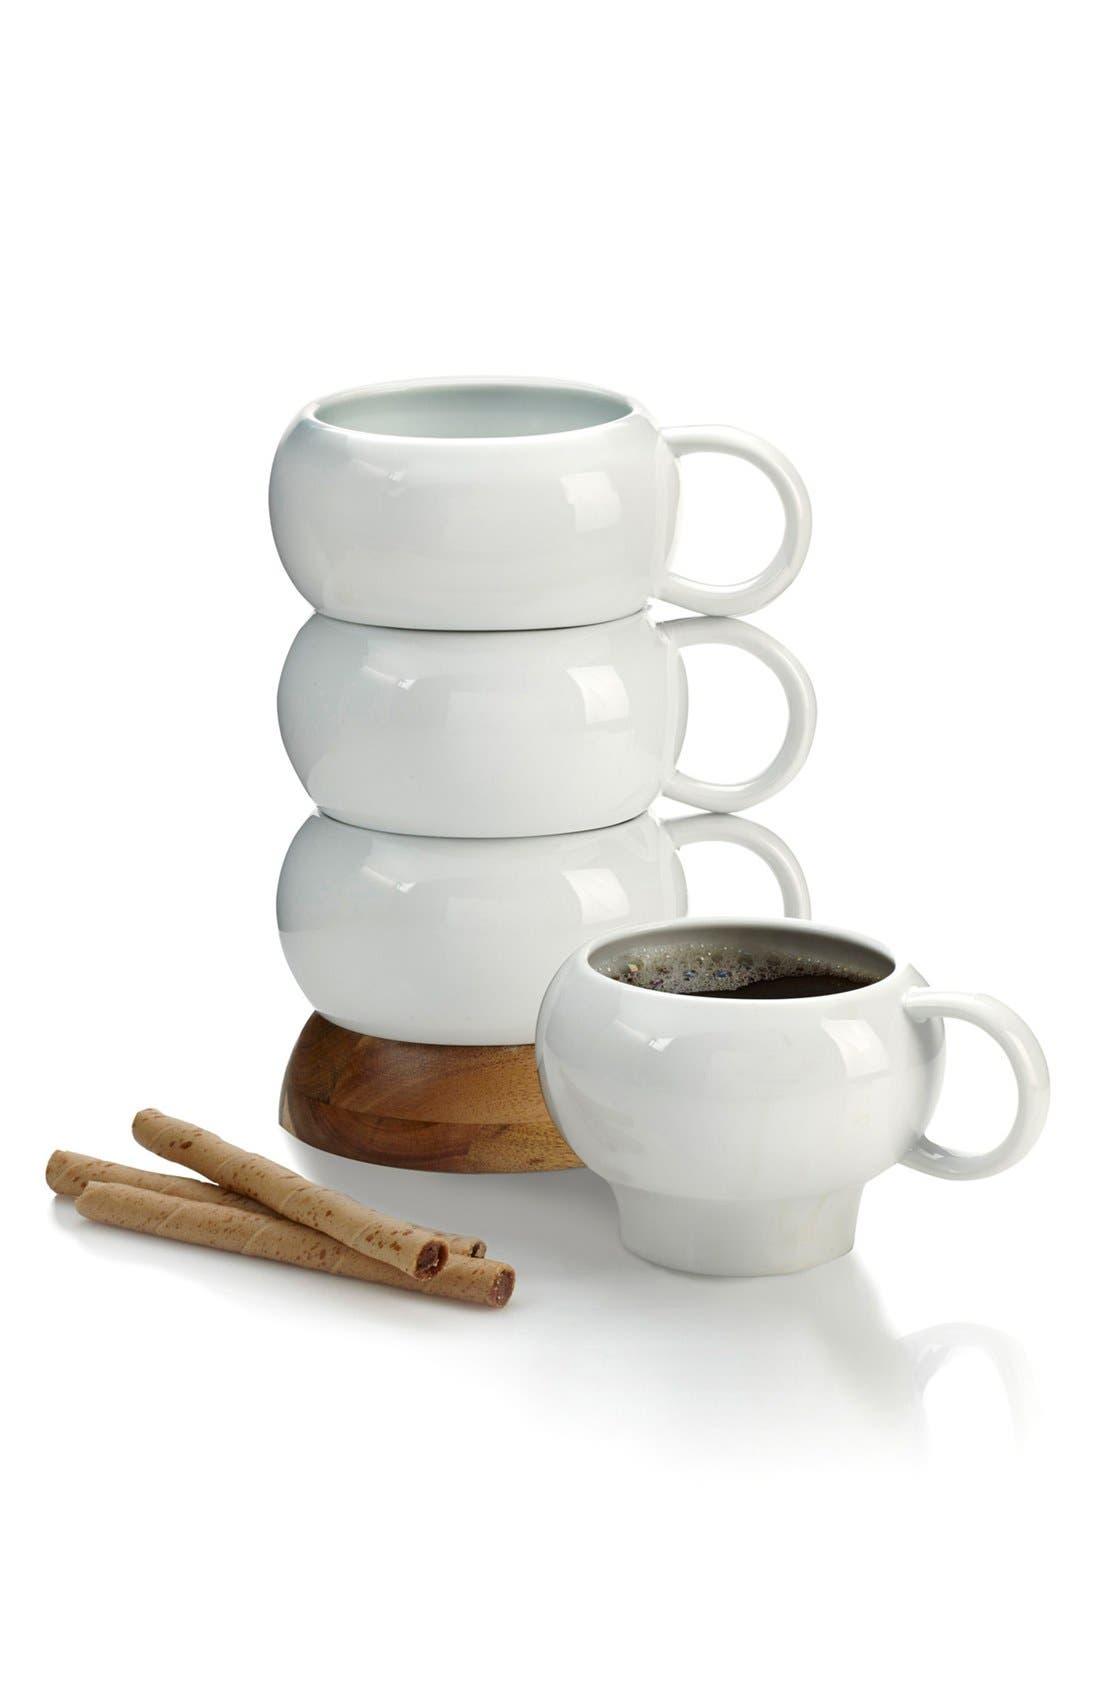 Main Image - Nambé Bulbo Set of 4 Stacked Coffee Mugs